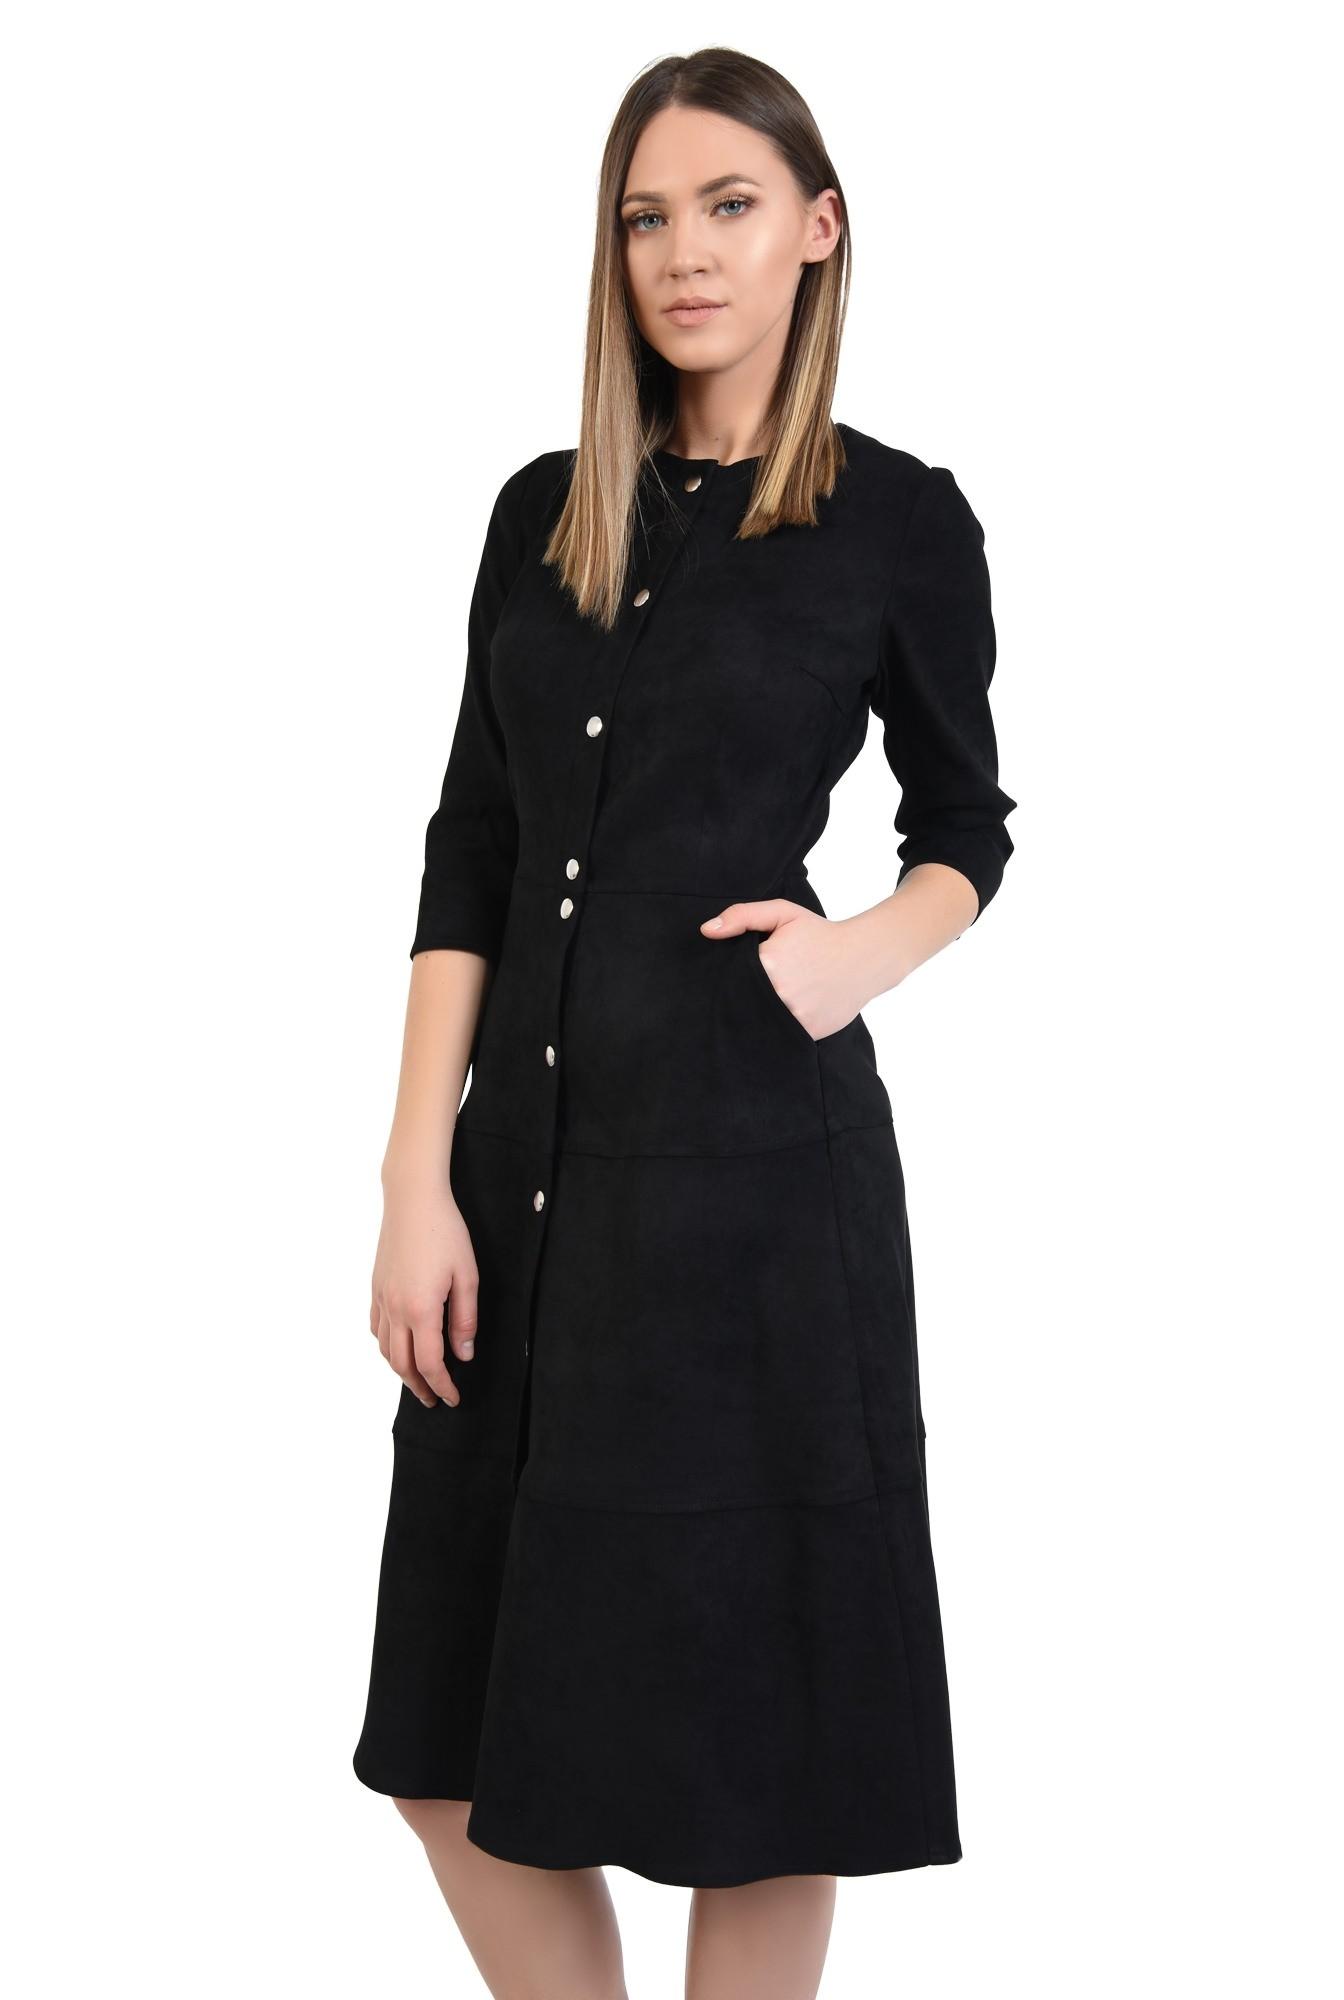 0 - rochie neagra, midi, evazata, din piele intoarsa ecologica